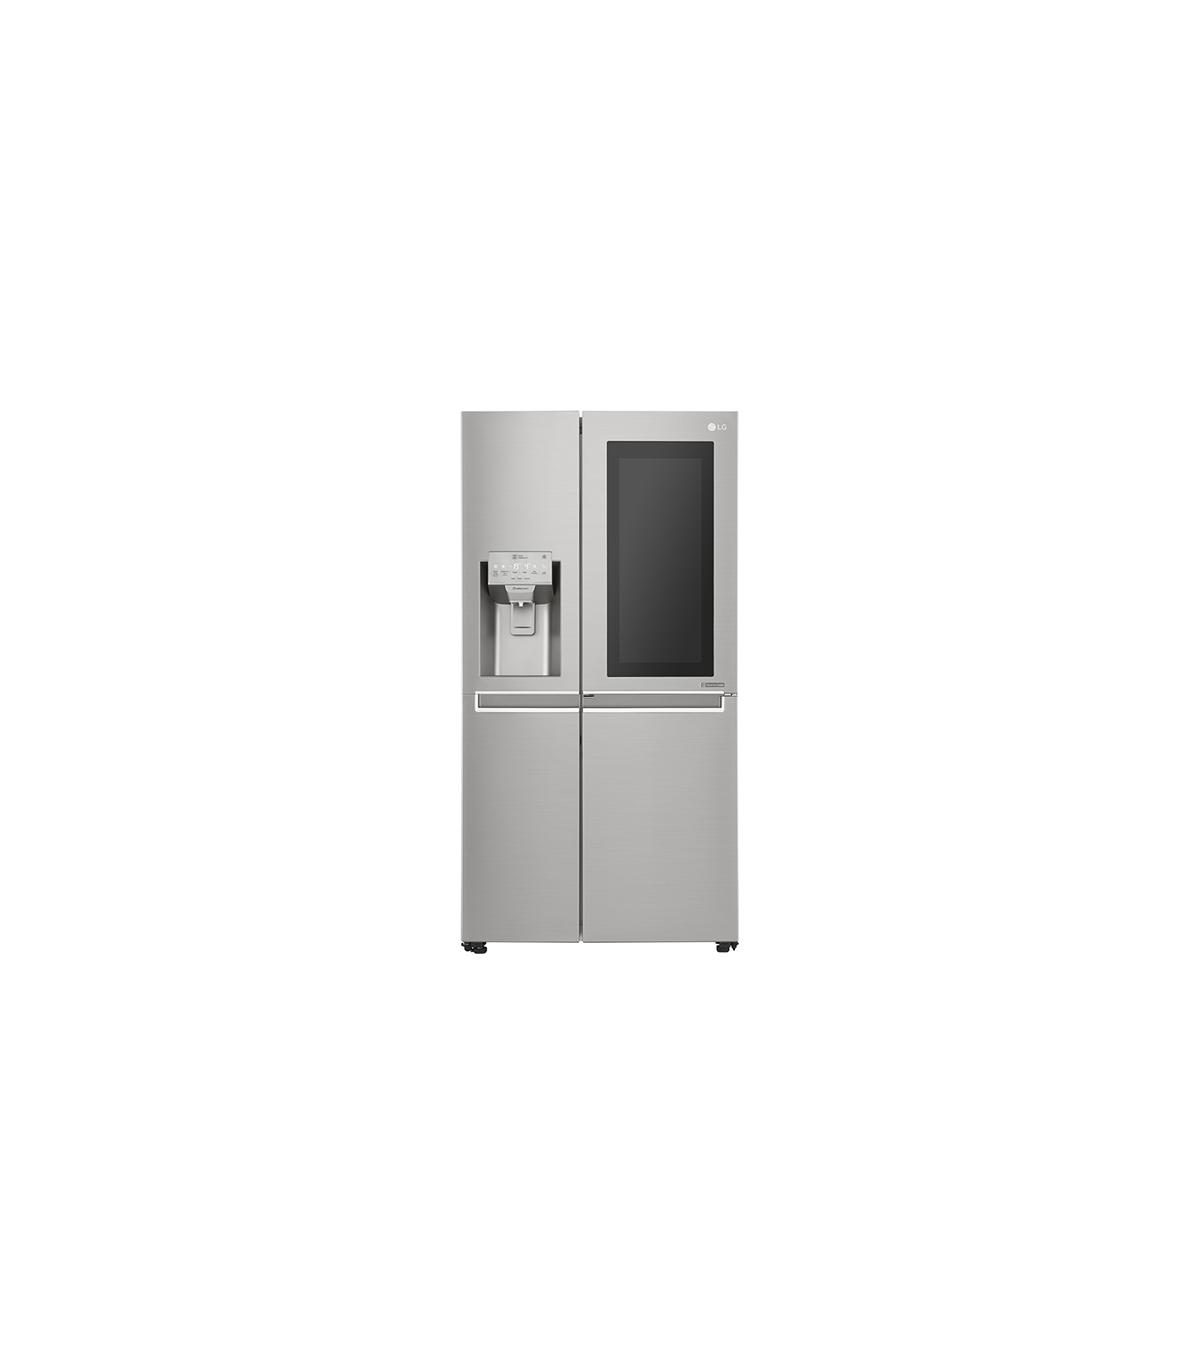 gsx961nsaz ansqeur lg. Black Bedroom Furniture Sets. Home Design Ideas